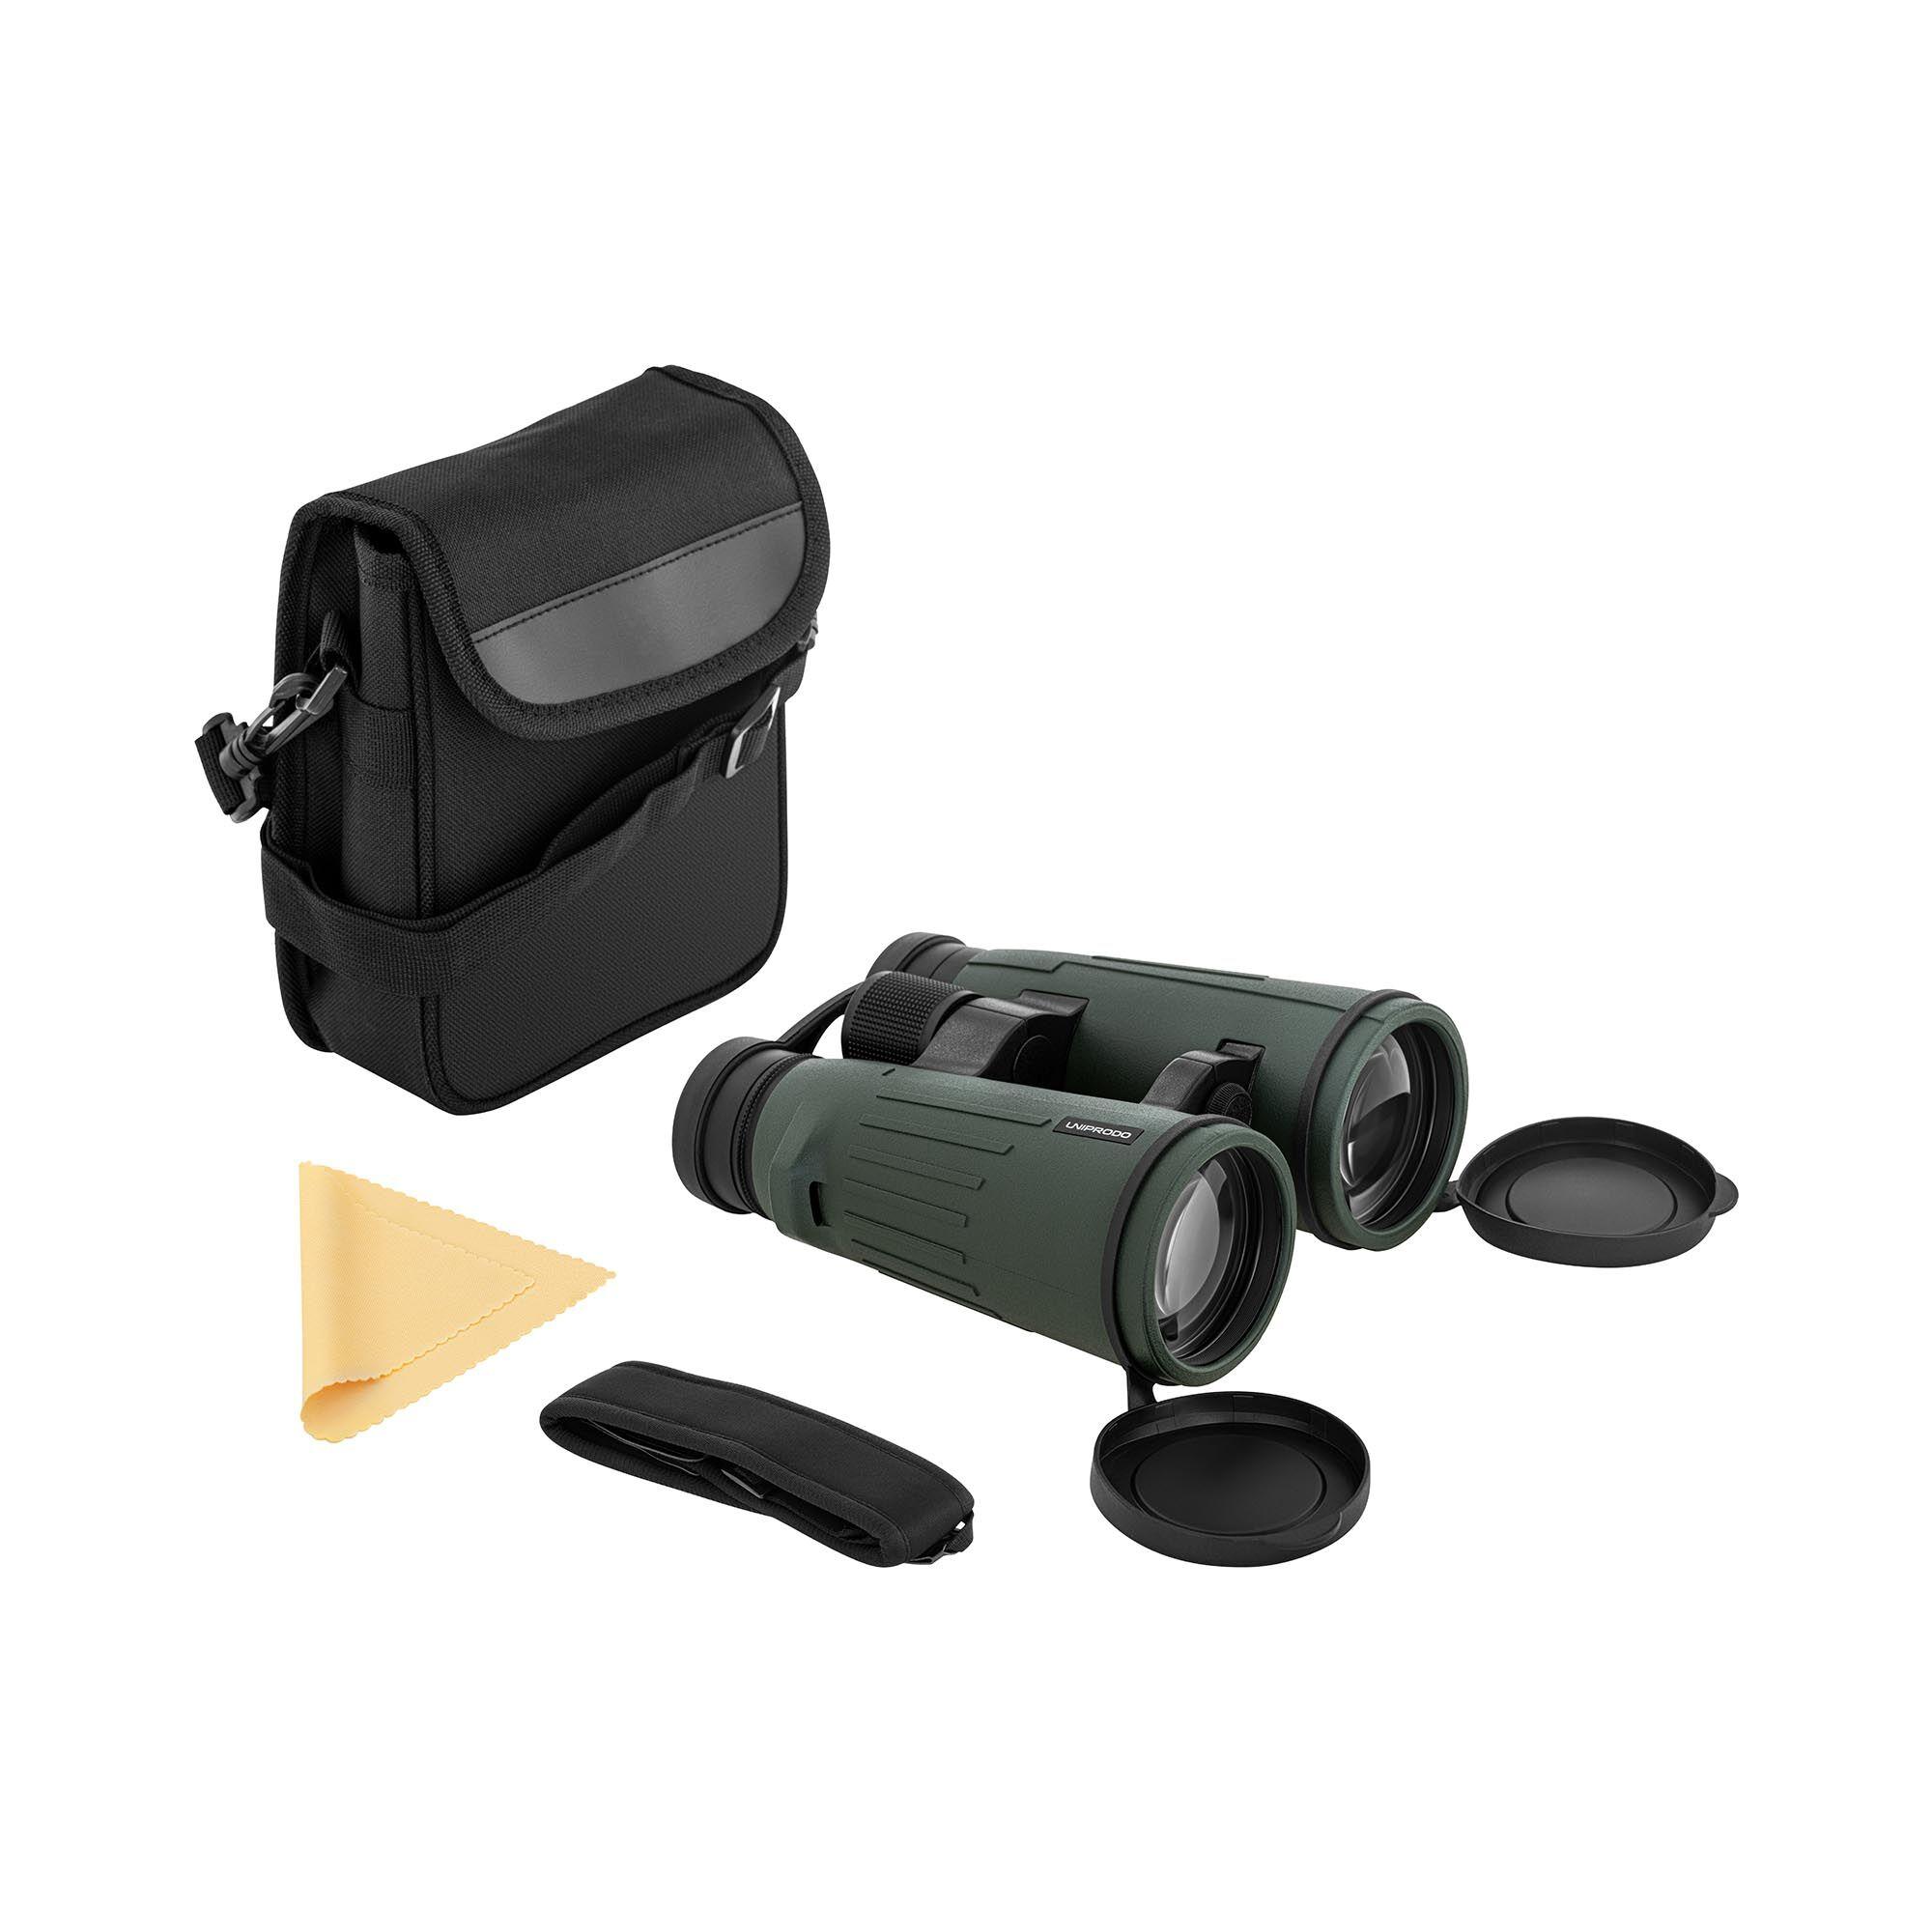 Uniprodo Binoculars - 8x56 - 8° - 112 m/1,000 m - BAK-4 - phase coated UNI_BINOCULAR_07